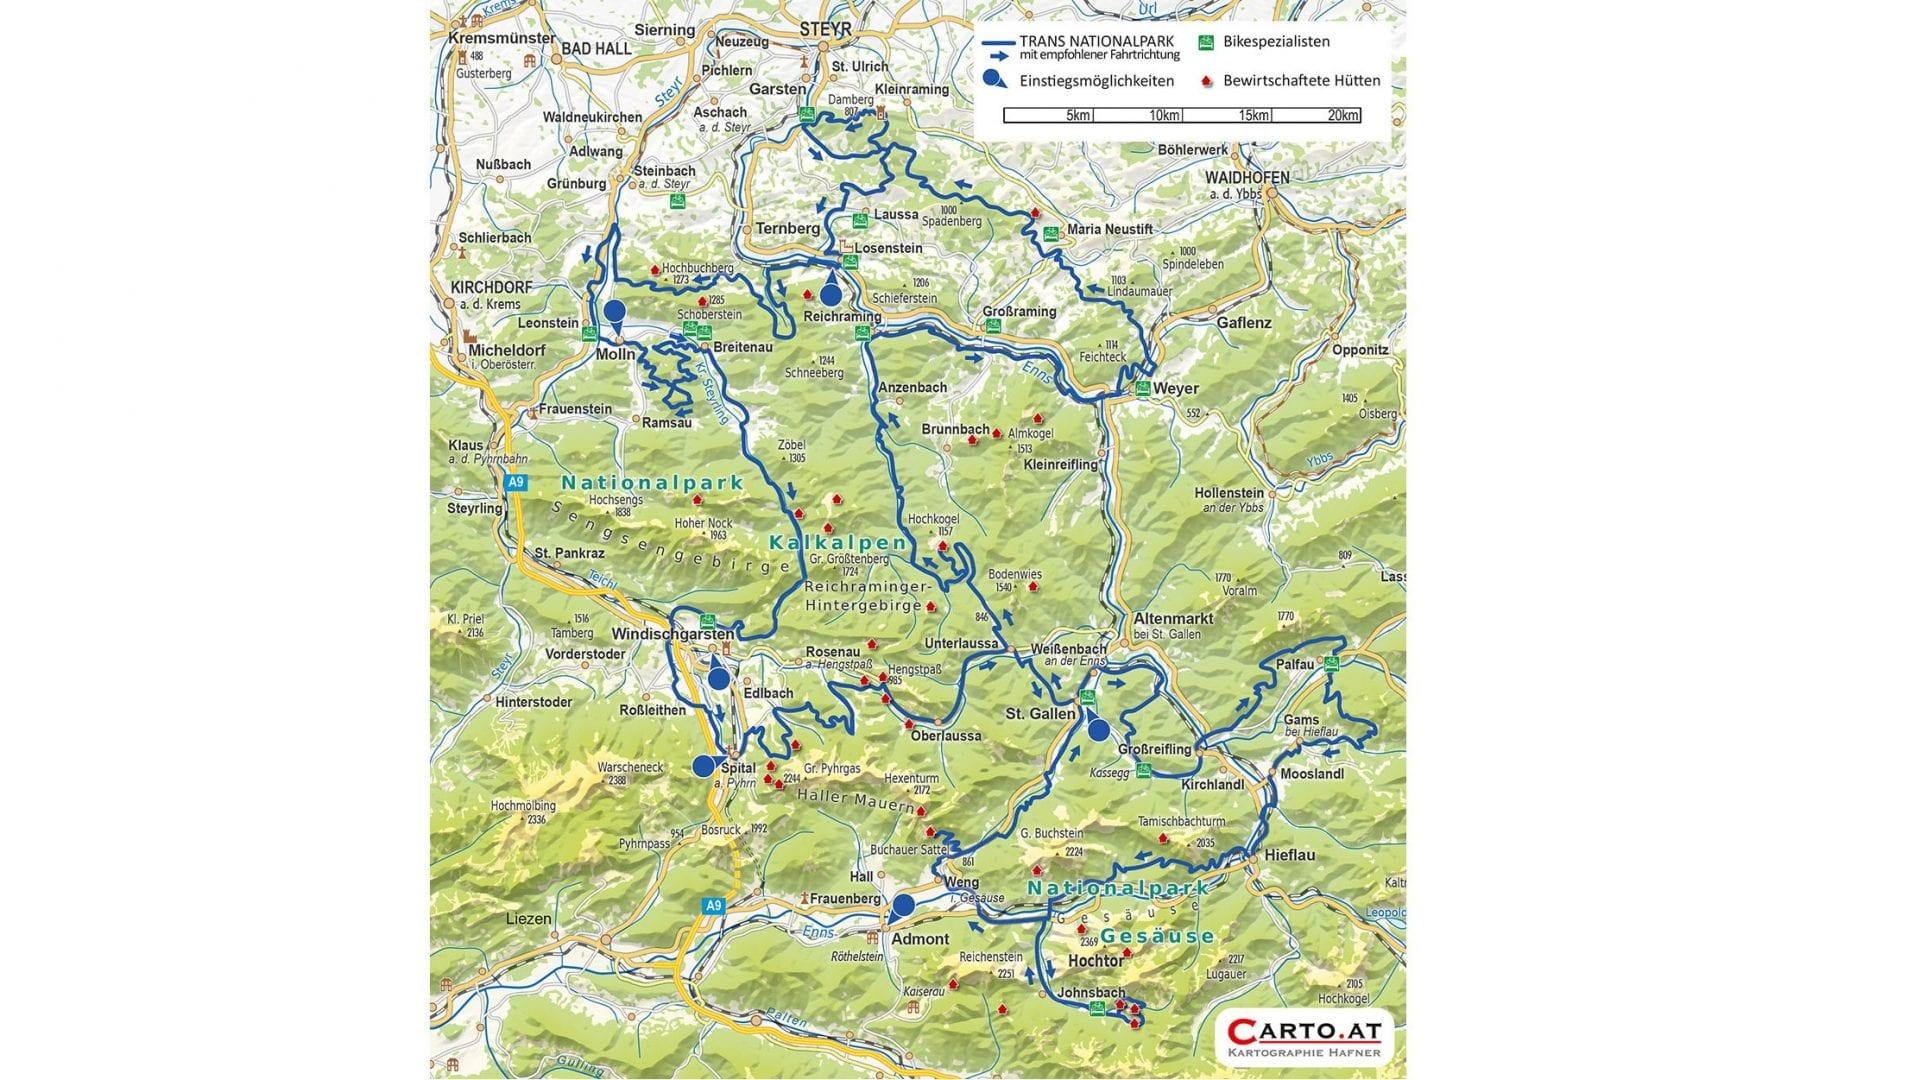 Trans Nationalpark - 13.300 Höhenmeter - 470 Kilometer